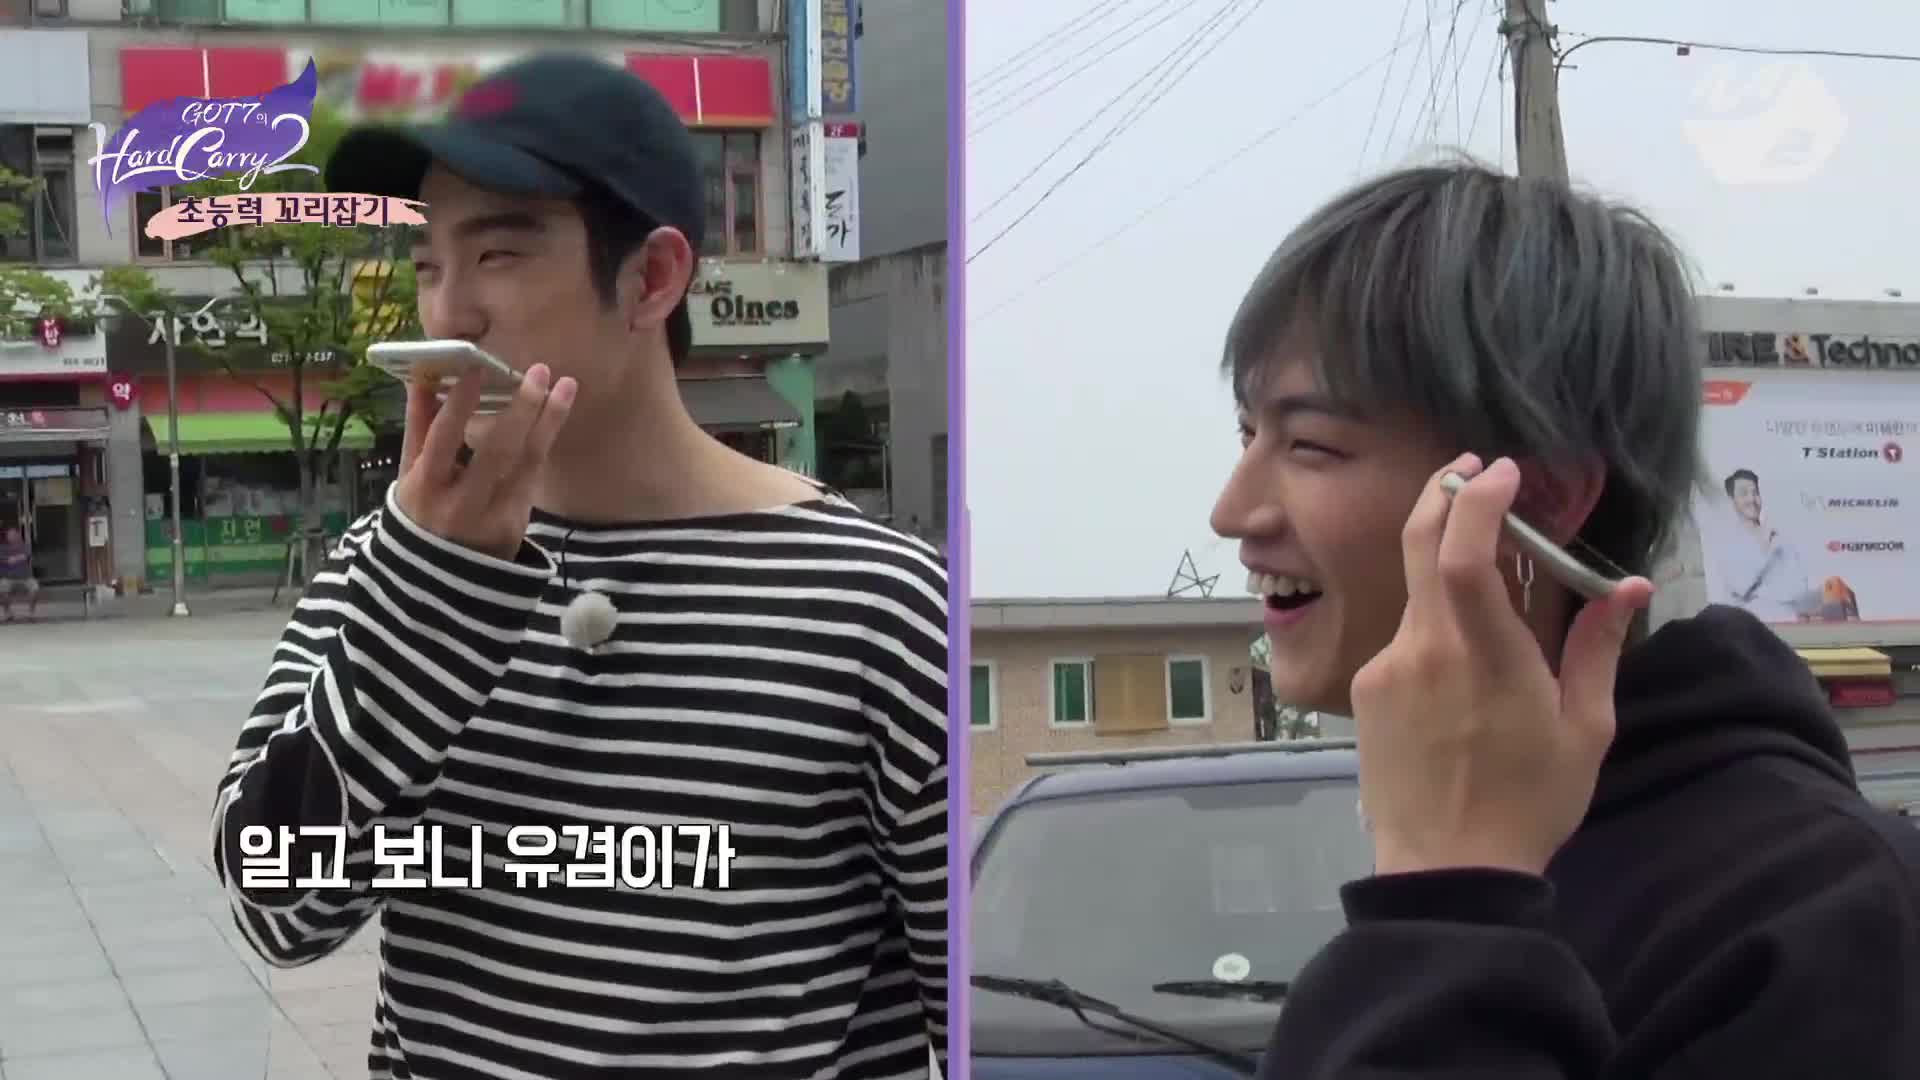 [FULL] Mnet '갓세븐의 하드캐리2' 3화 (GOT7 'HARD CARRY 2' ep.3)